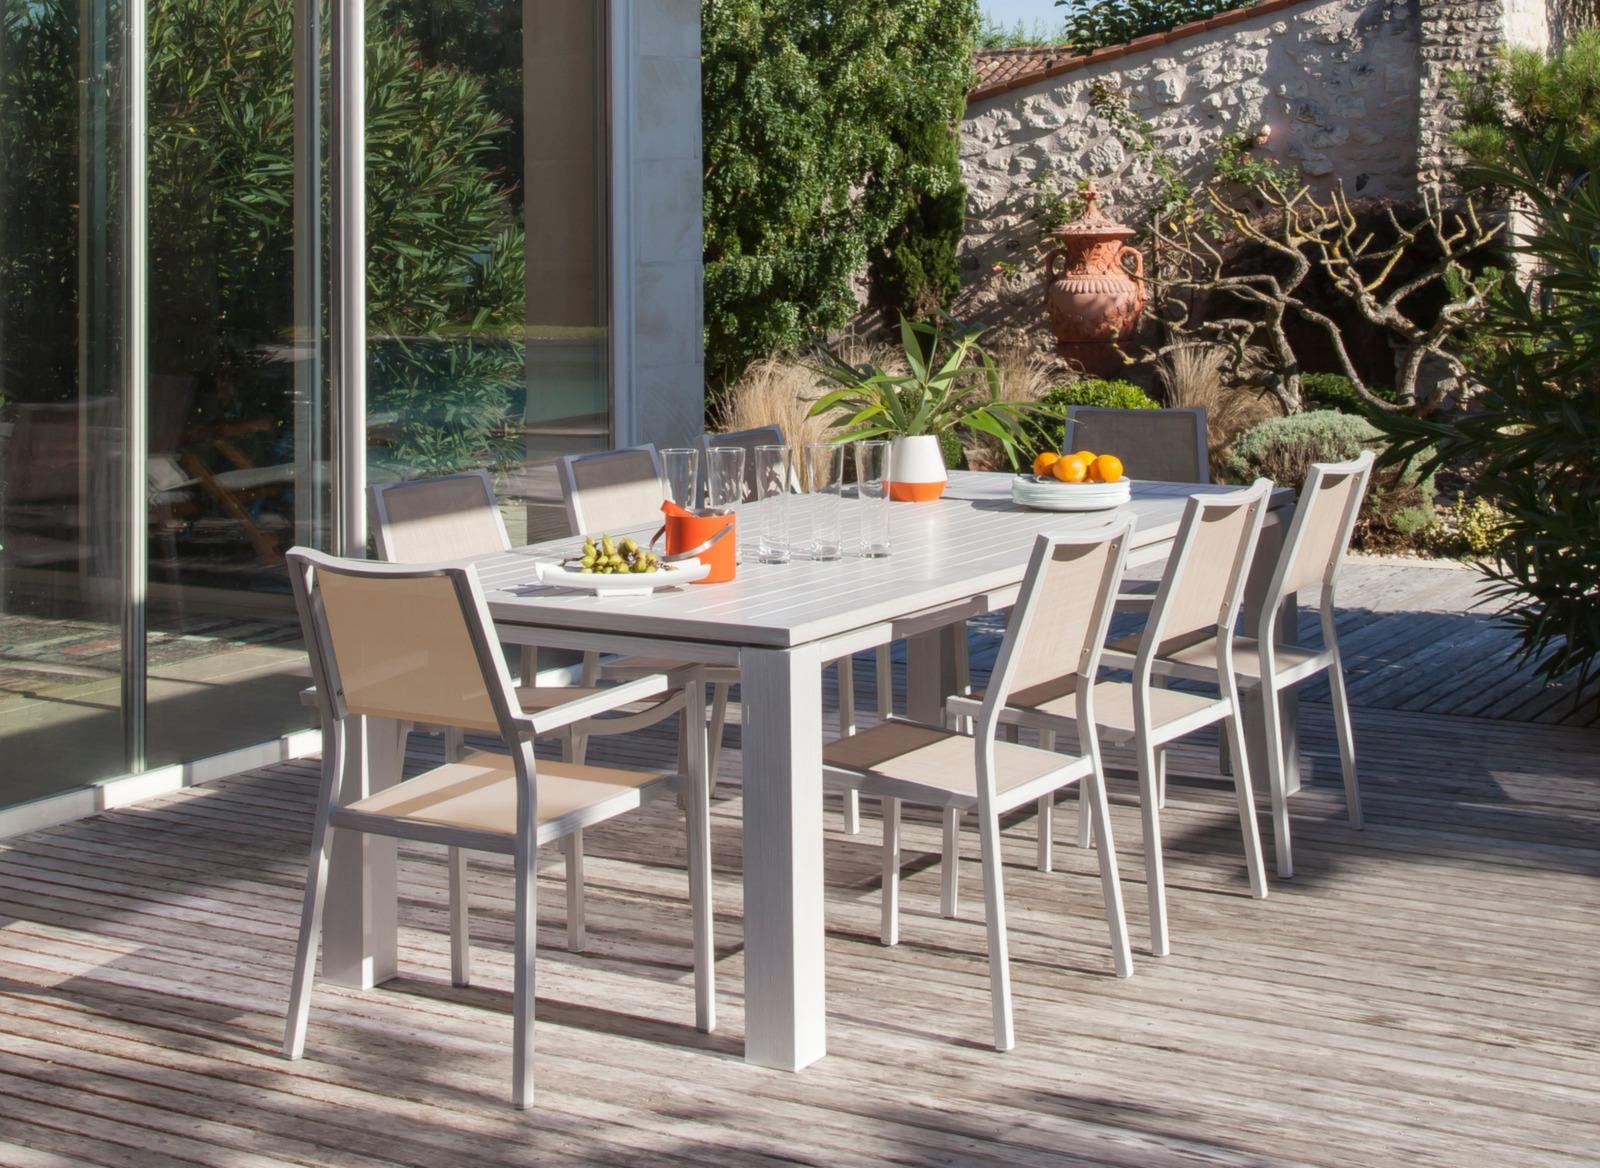 Table de jardin 240x100cm Fiero - Promotions - Proloisirs